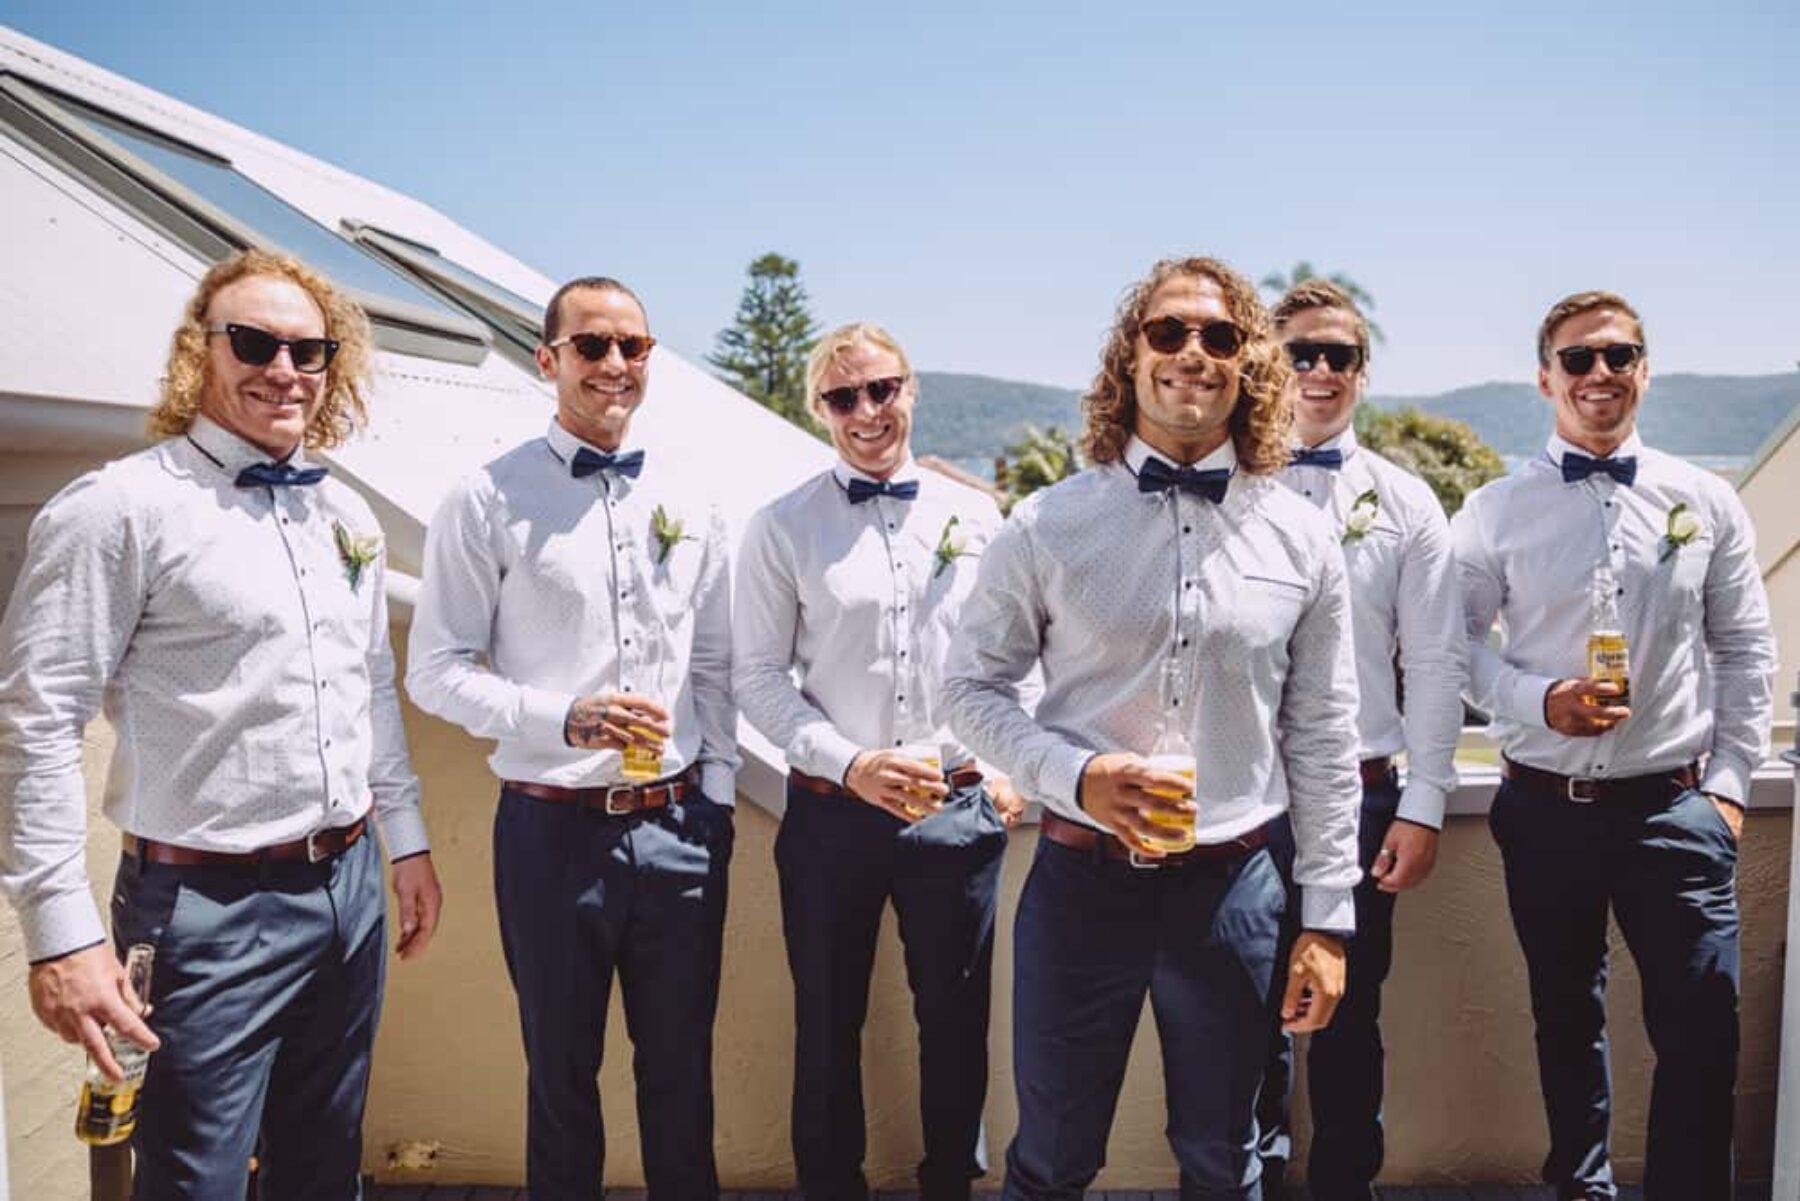 casual stylish groomsmen